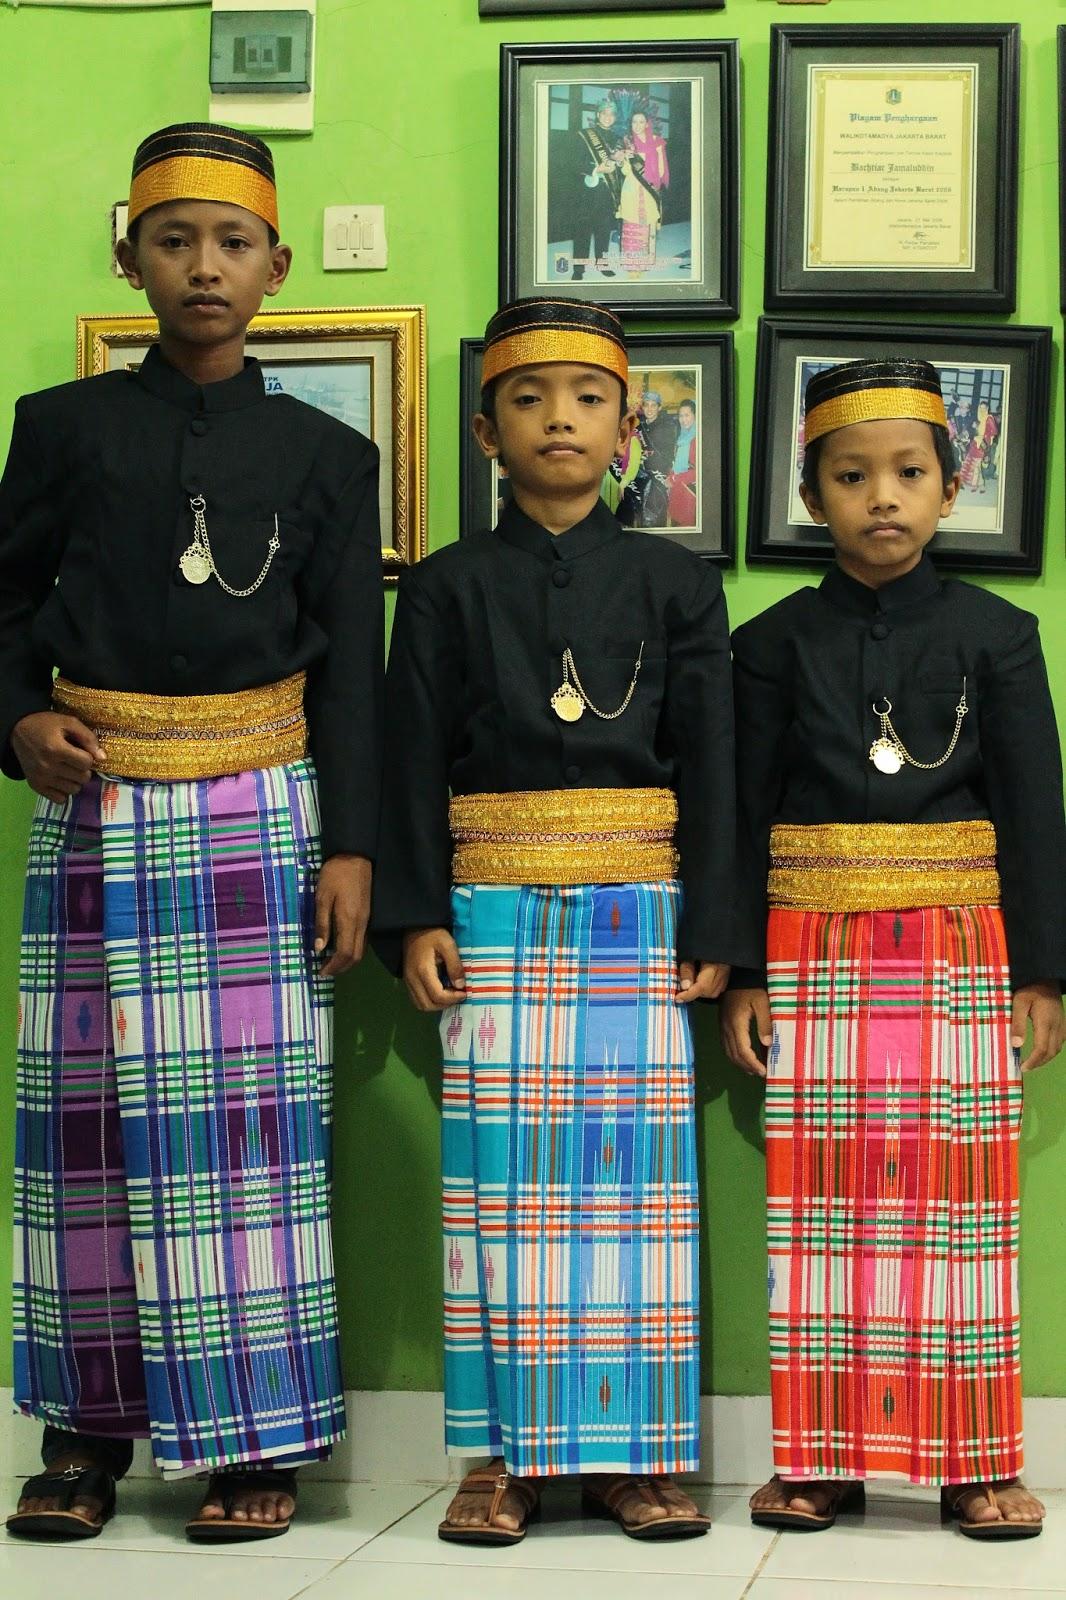 Anak sma indonesia - 3 3